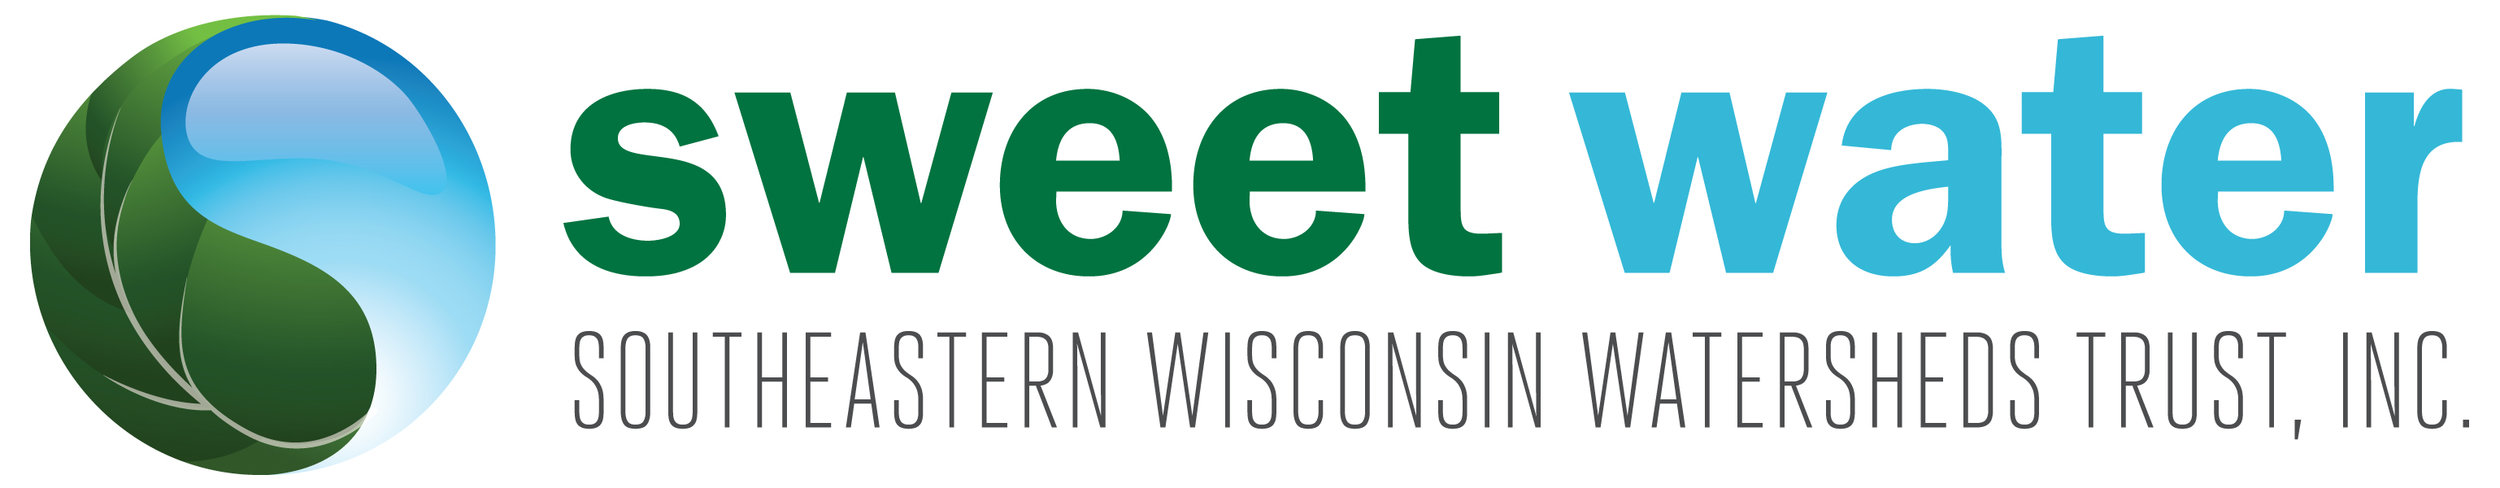 Sweet Water full logo  Color  12-2011.JPG